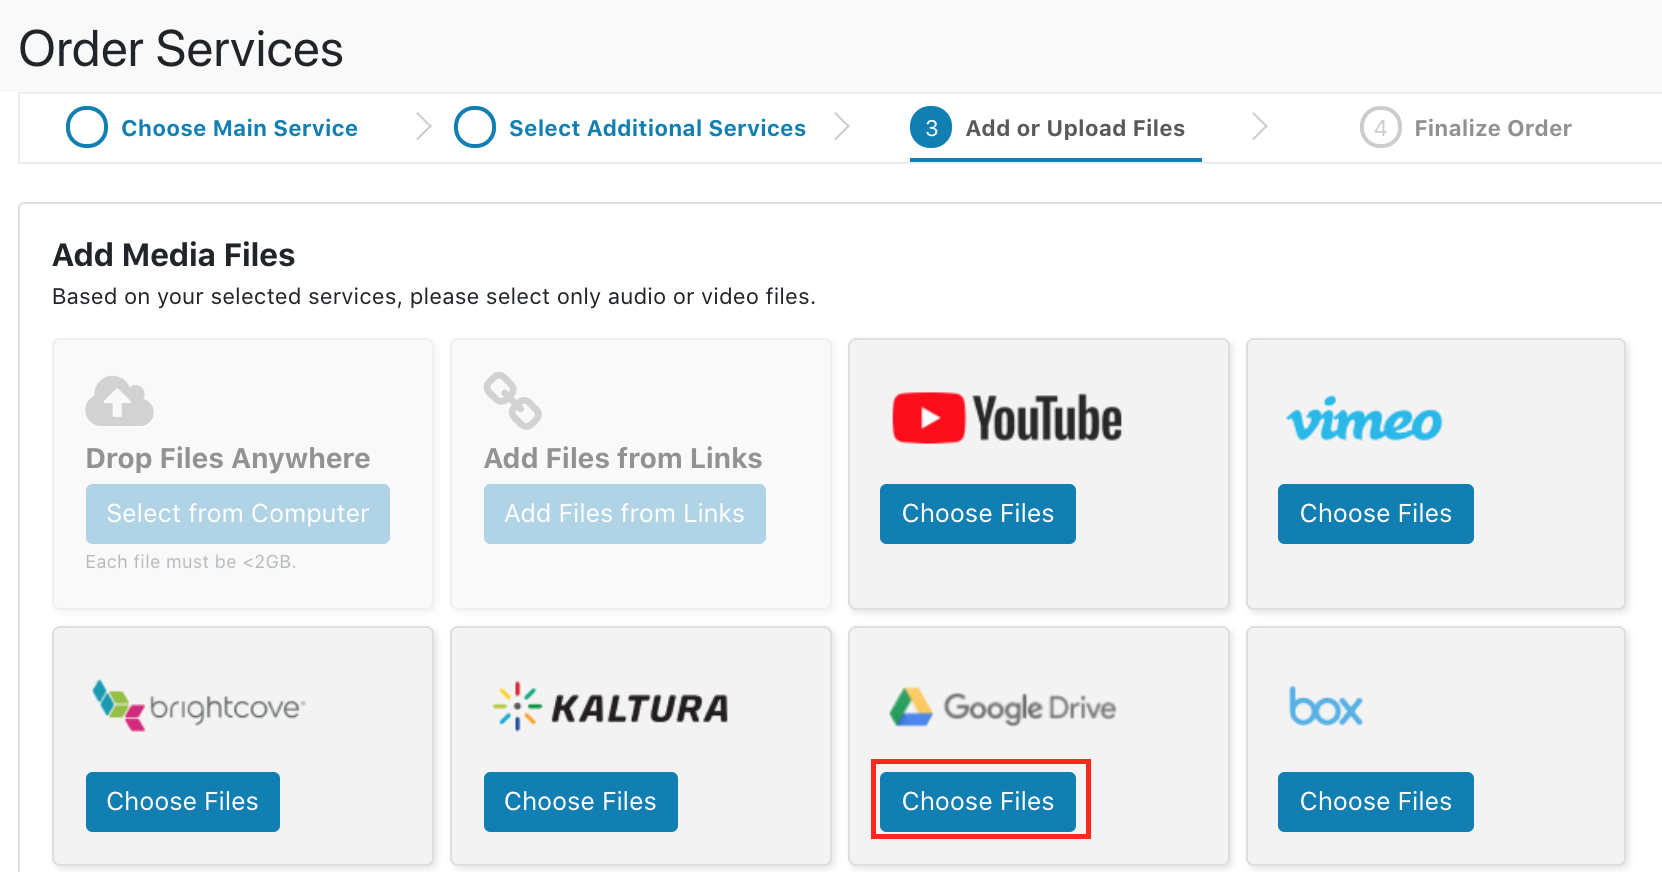 Linked Cloud Storage Account